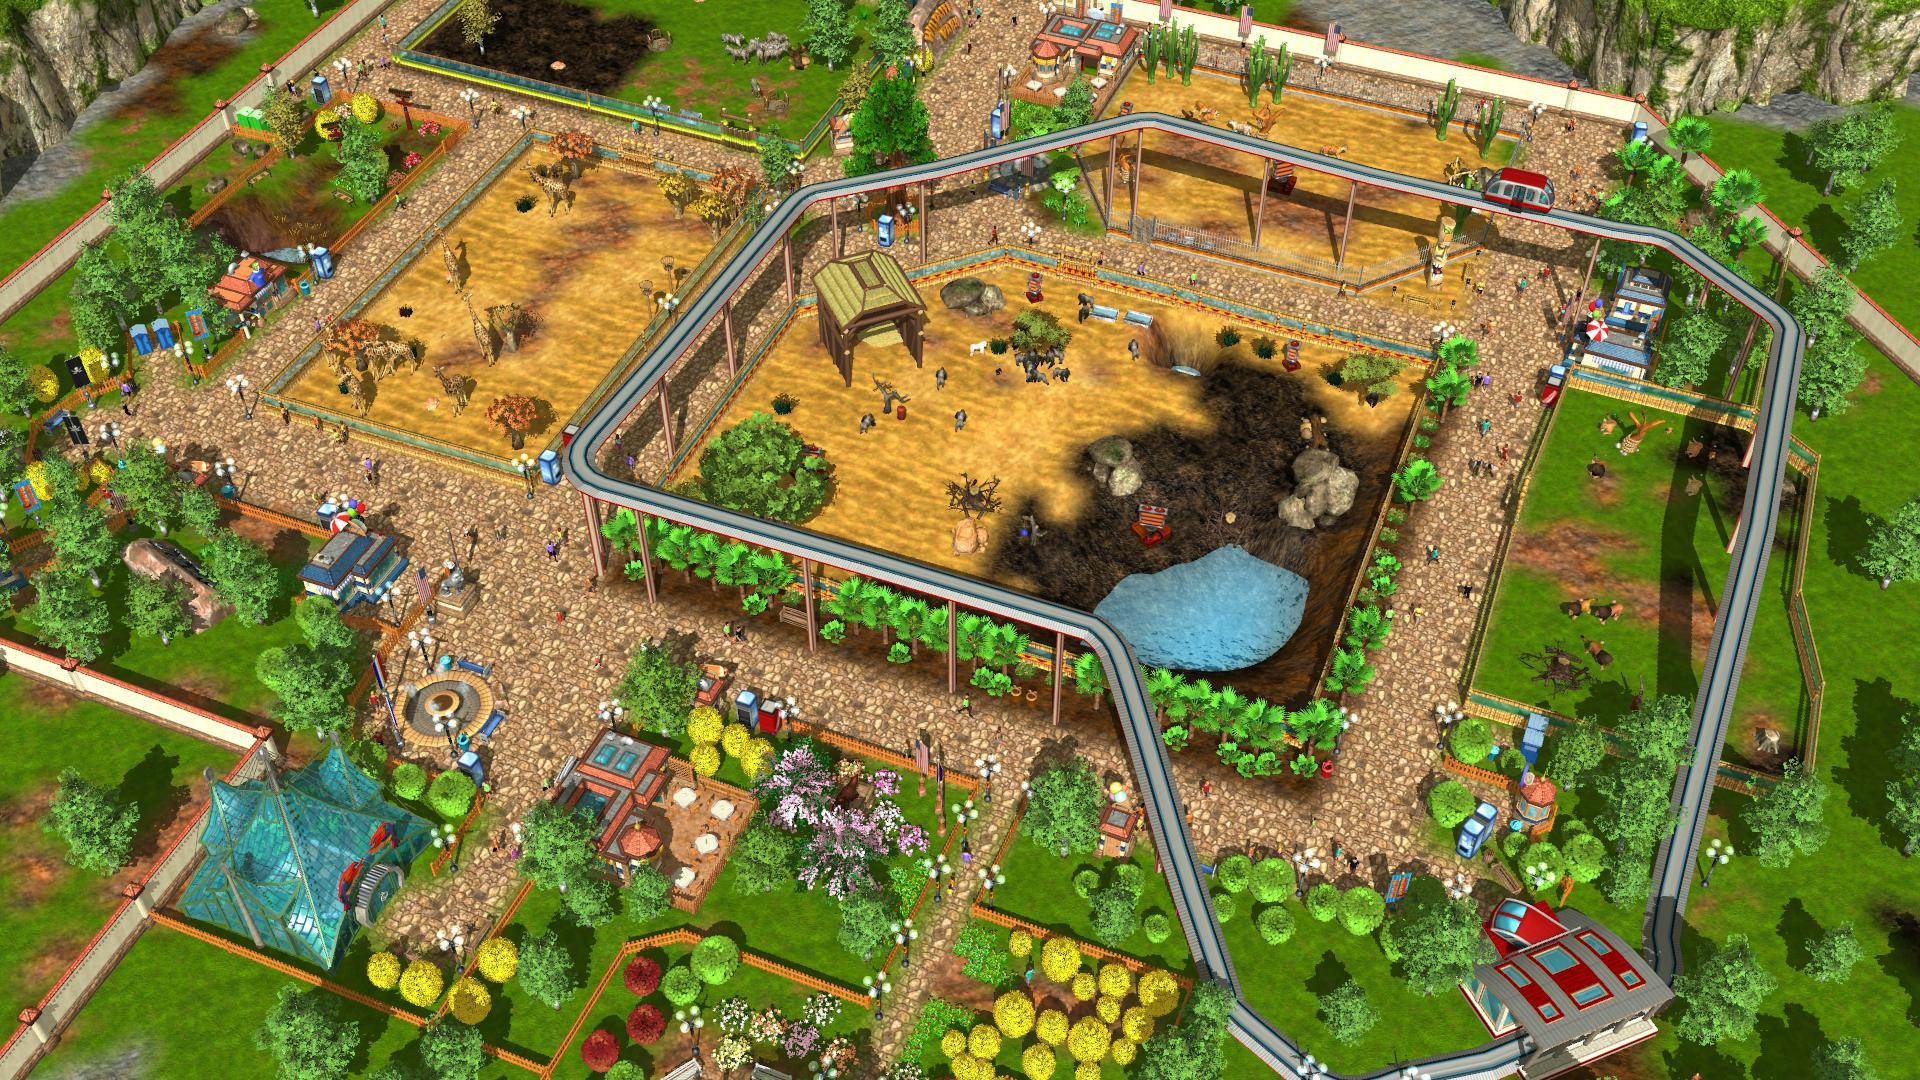 Home Design Game Download Free Wildlife Park 3 On Steam